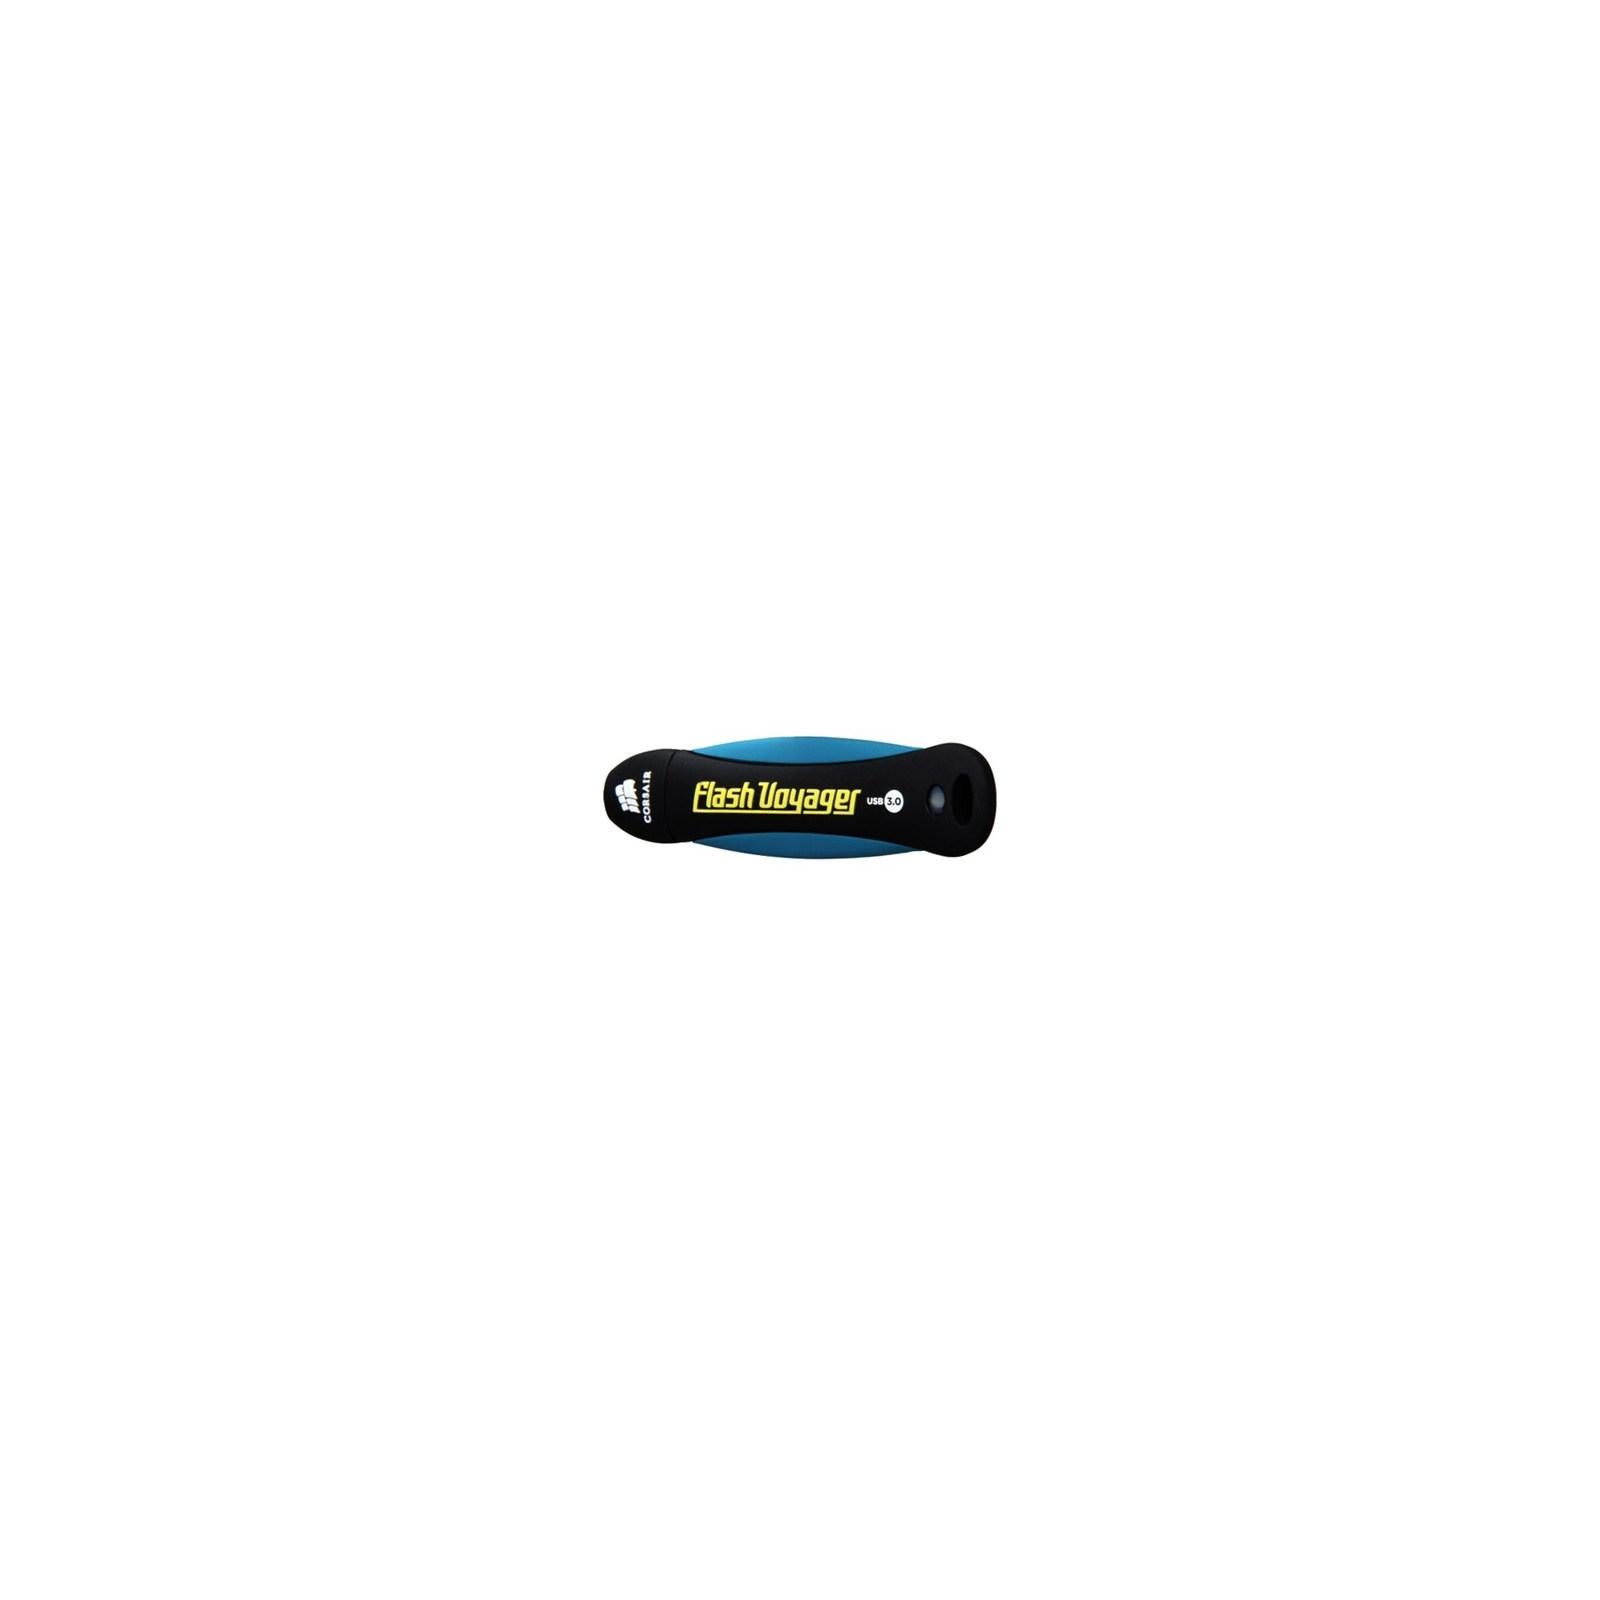 USB флеш накопитель 8Gb Flash Voyager USB3.0 CORSAIR (CMFVY3-8GB)